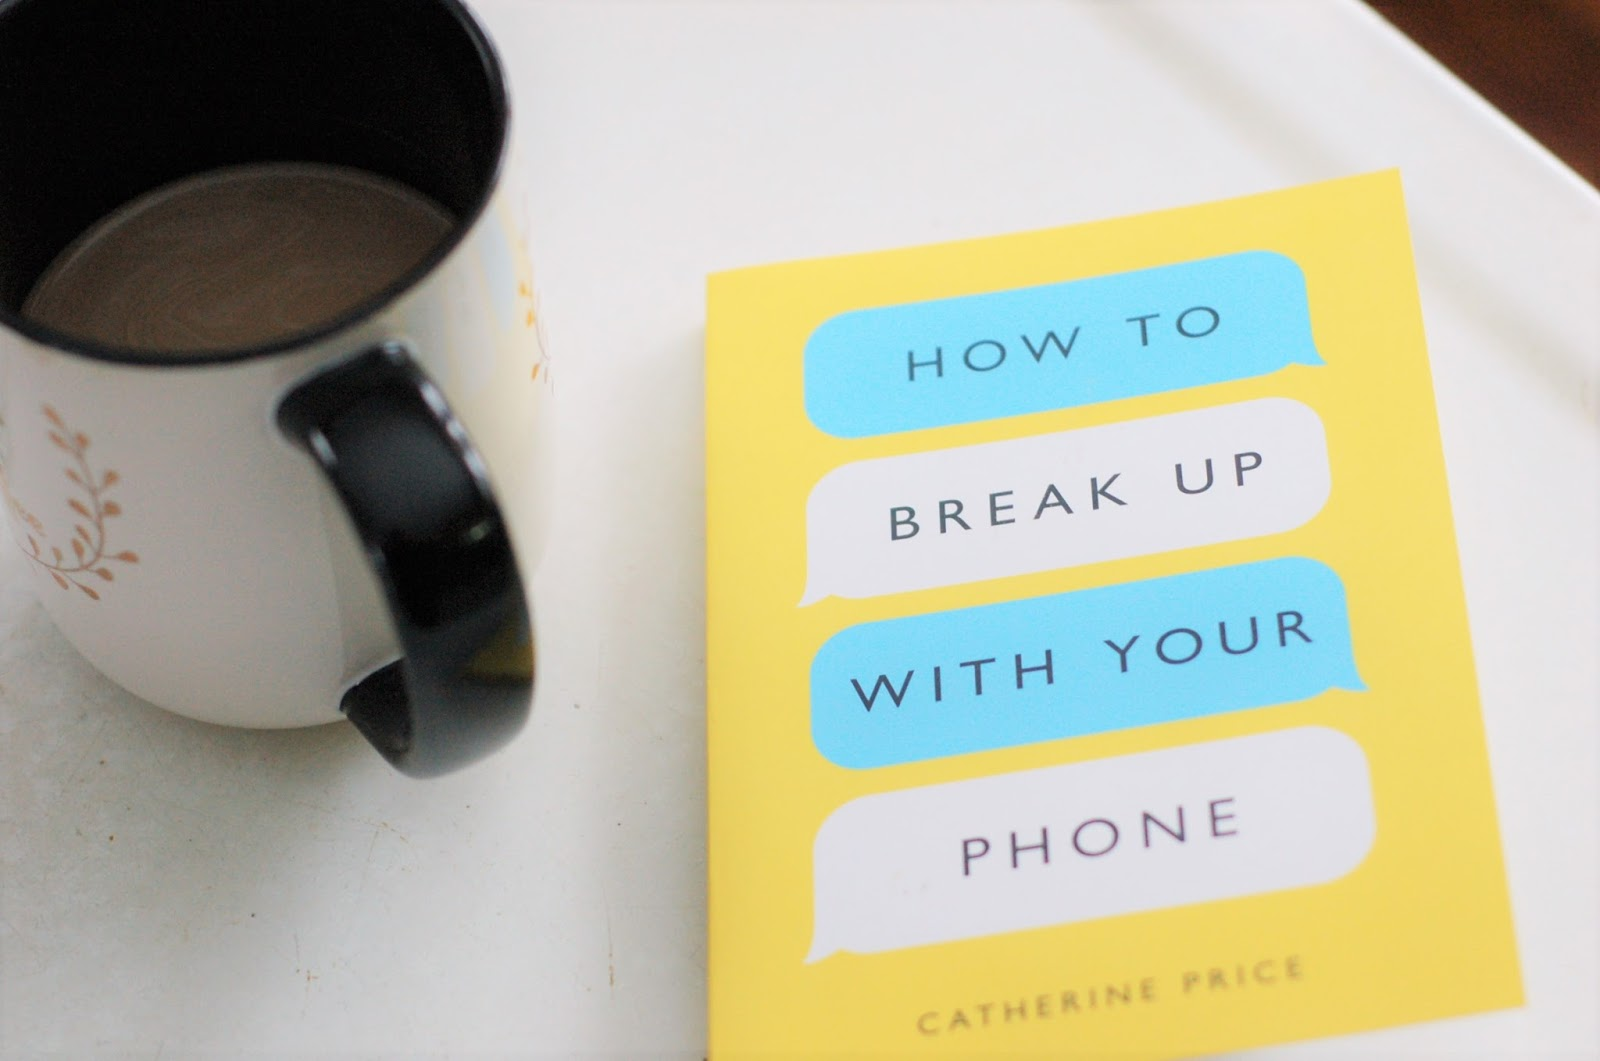 How to break the phone